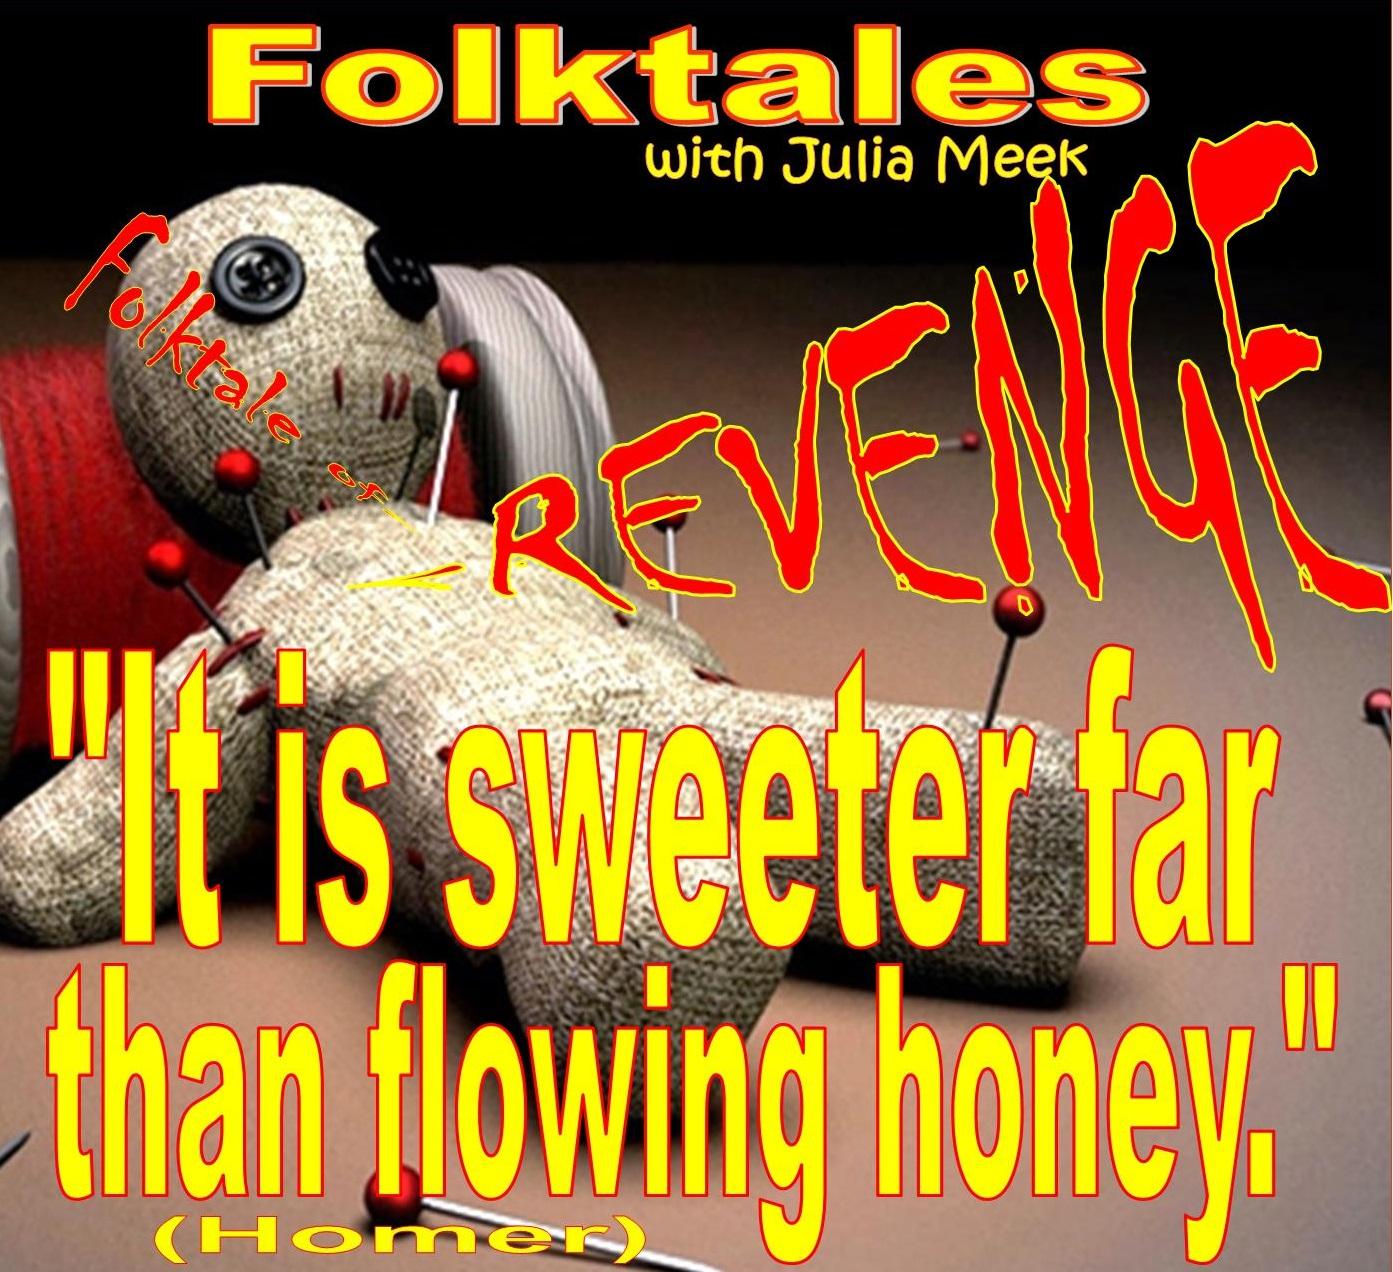 Caption: WBOI's Folkale of Revenge, Credit: Julia Meek